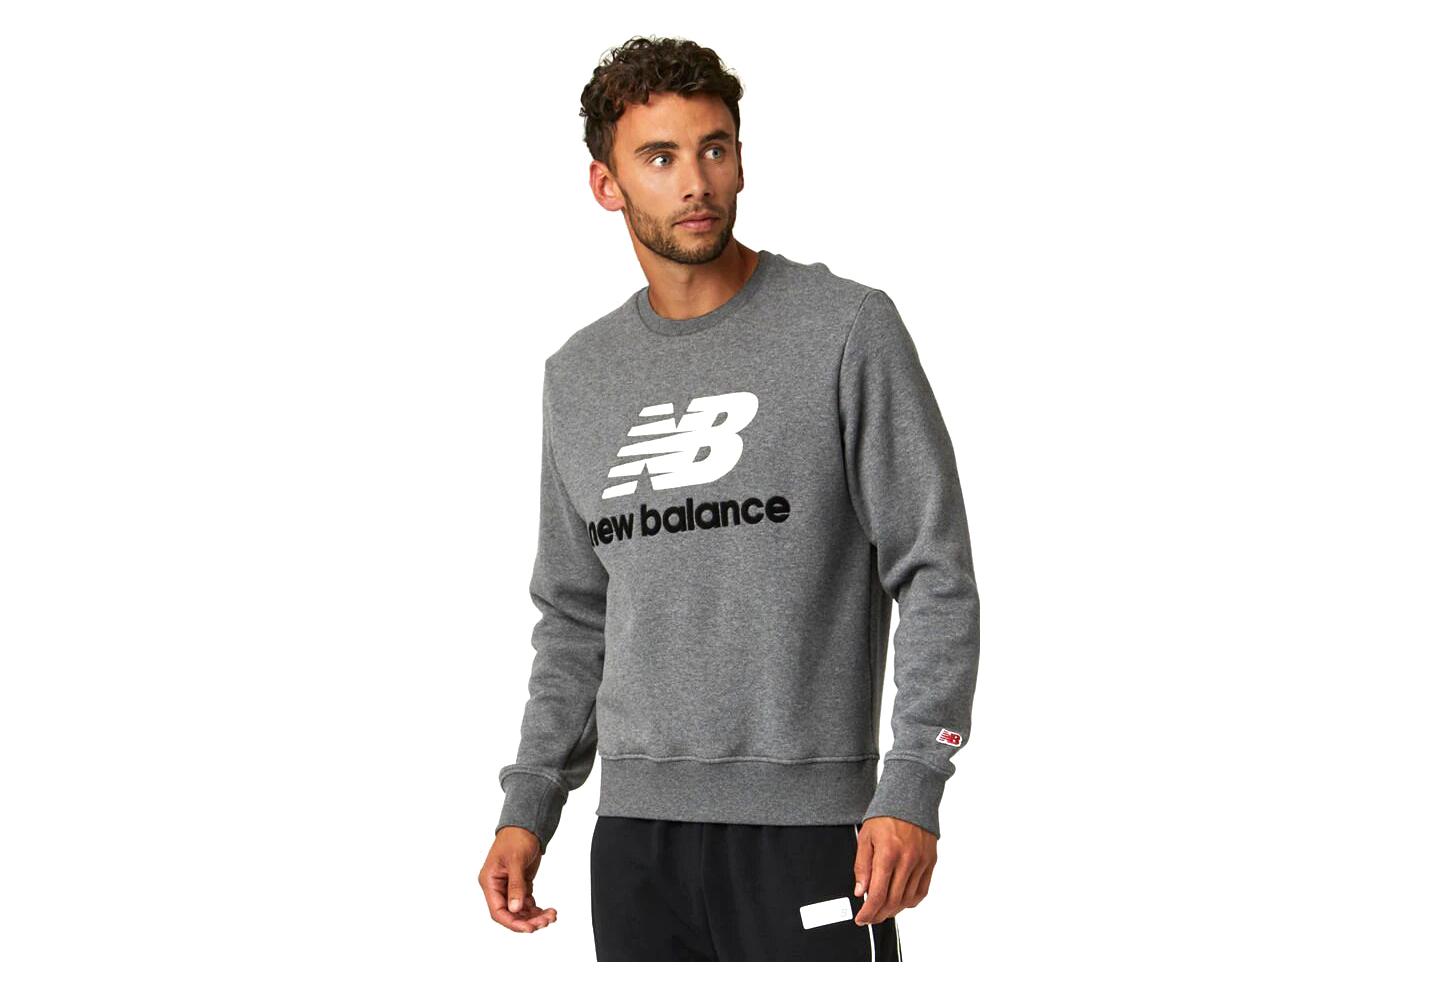 New Balance NB Athletics Sweat Grey Men | Alltricks.com